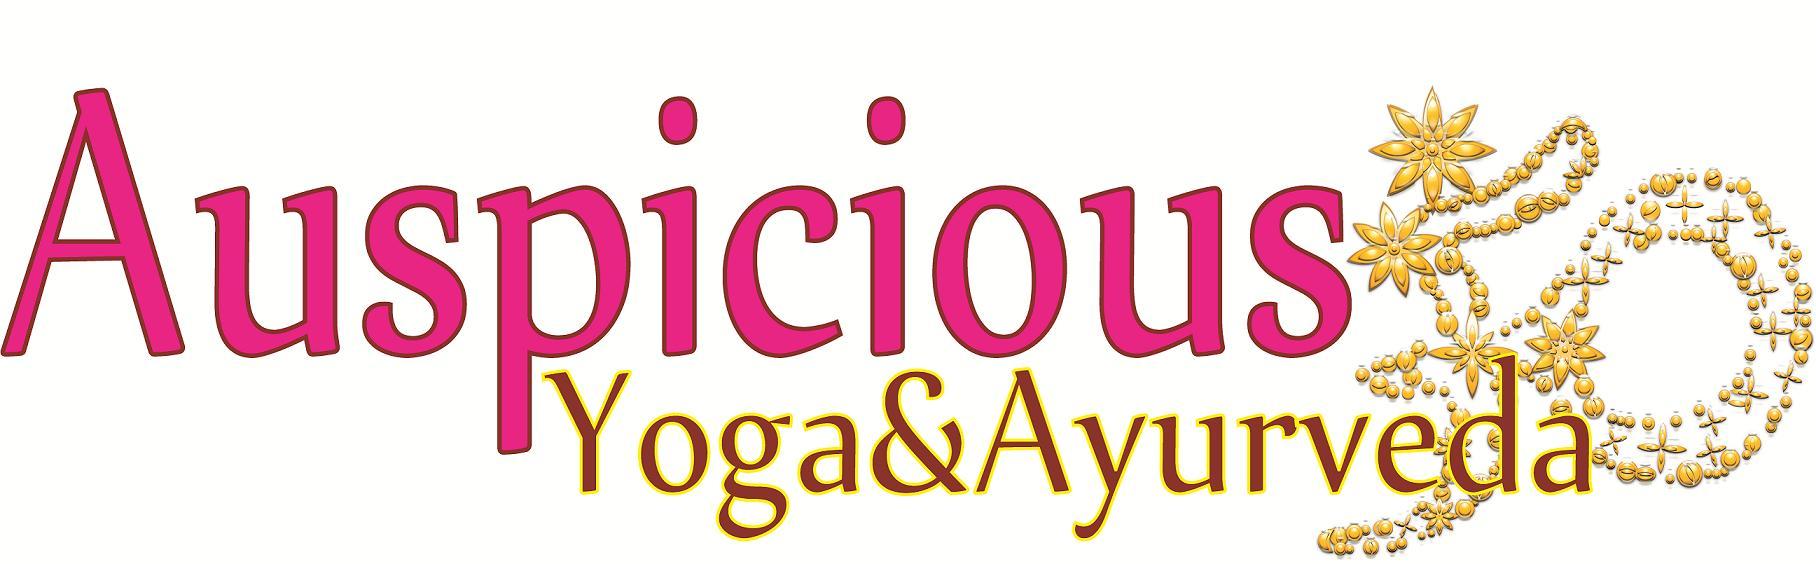 [52A1] Auspicious Yoga&Ayurveda